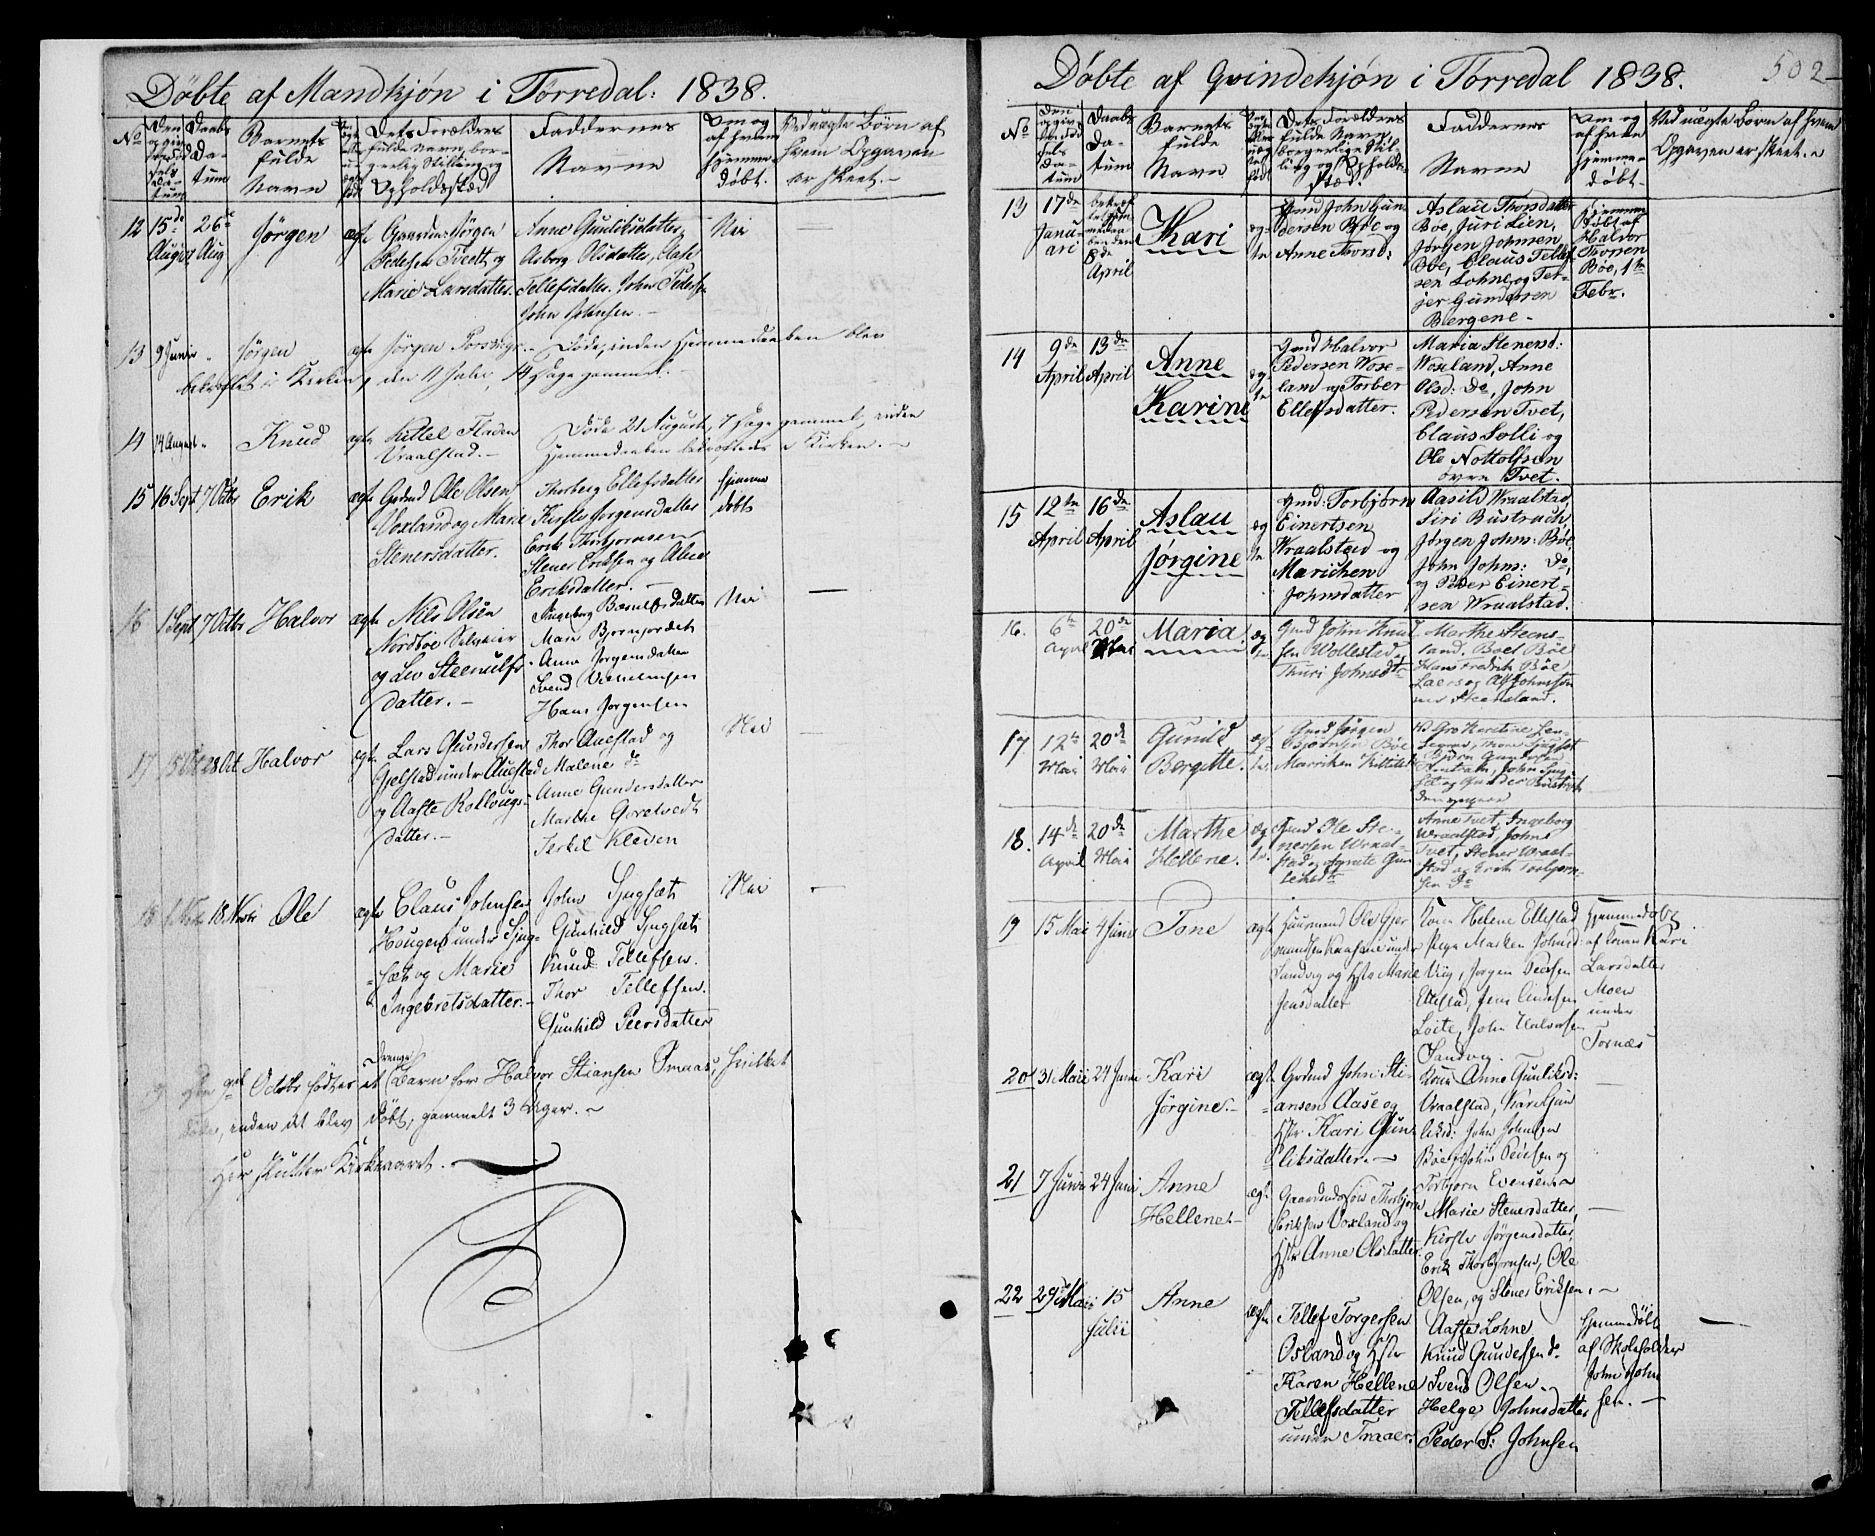 SAKO, Drangedal kirkebøker, F/Fa/L0007b: Ministerialbok nr. 7b, 1837-1856, s. 502